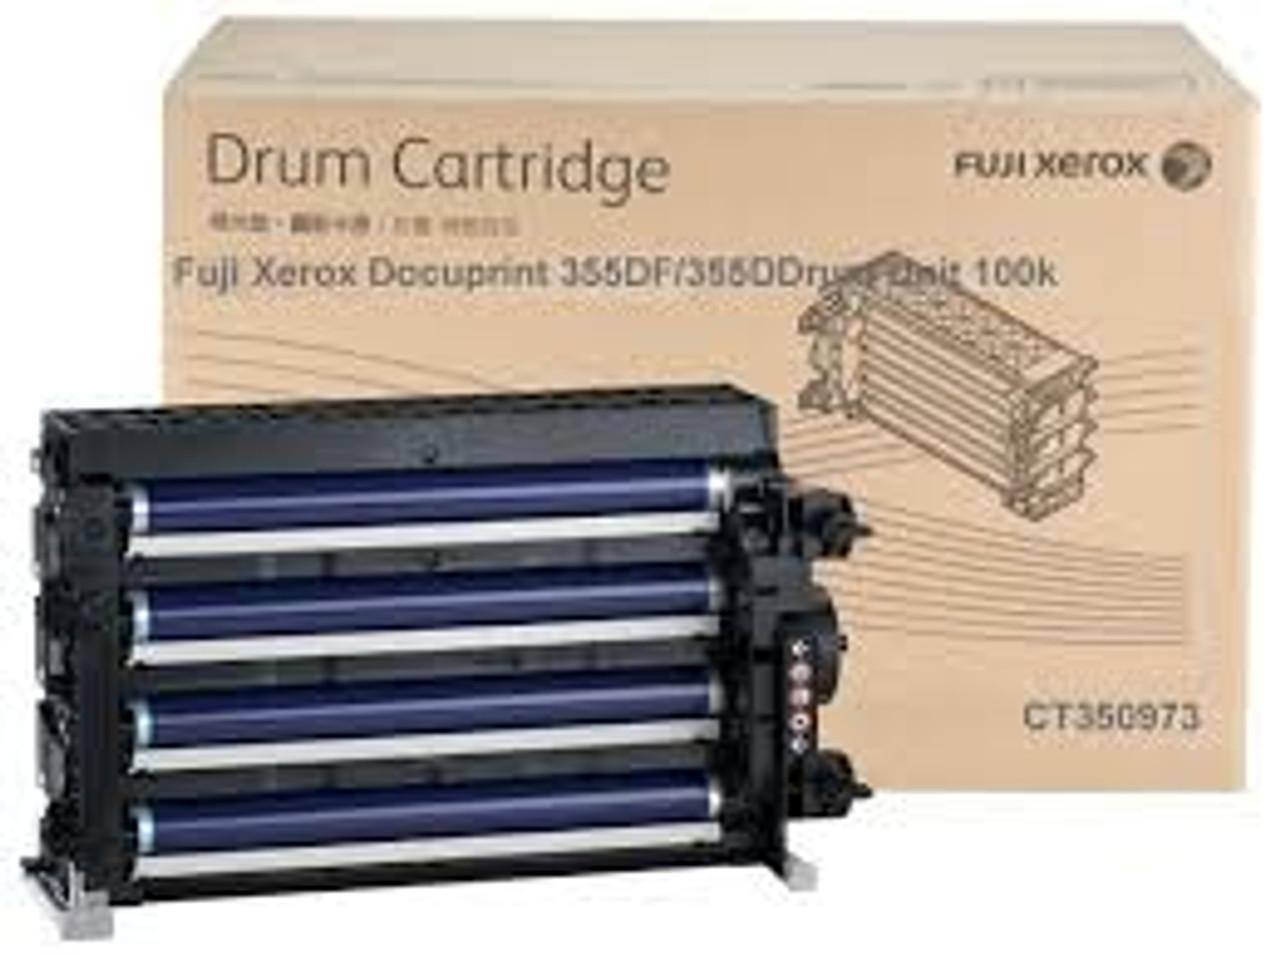 Fuji Xerox DocuPrint P355D / M355DF / P365DW Drum Cartridge